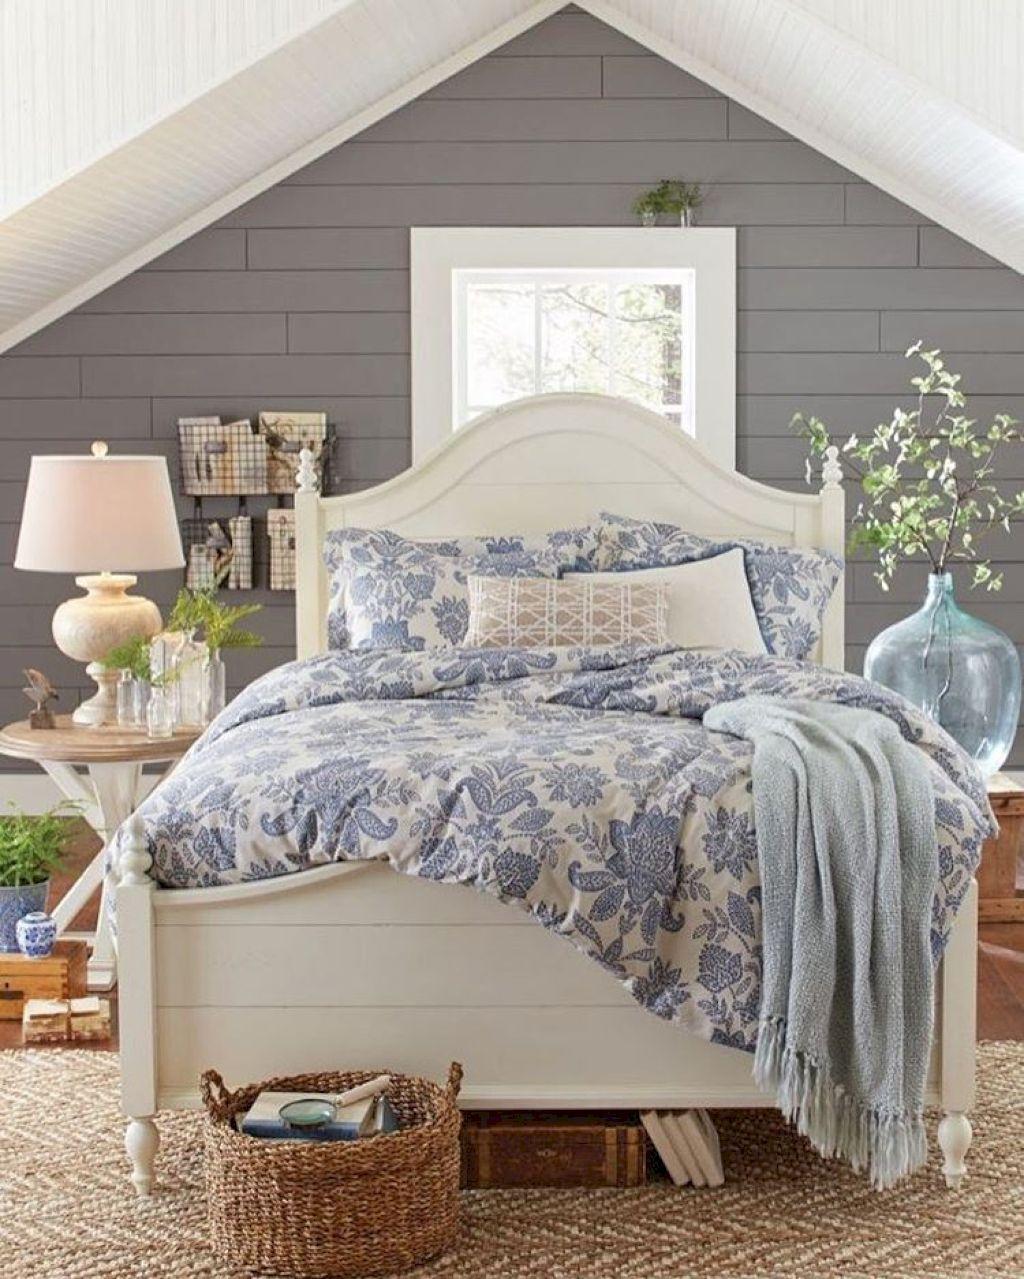 Cool 35 Comfy Farmhouse Bedroom Design Ideas Https Bellezaroom